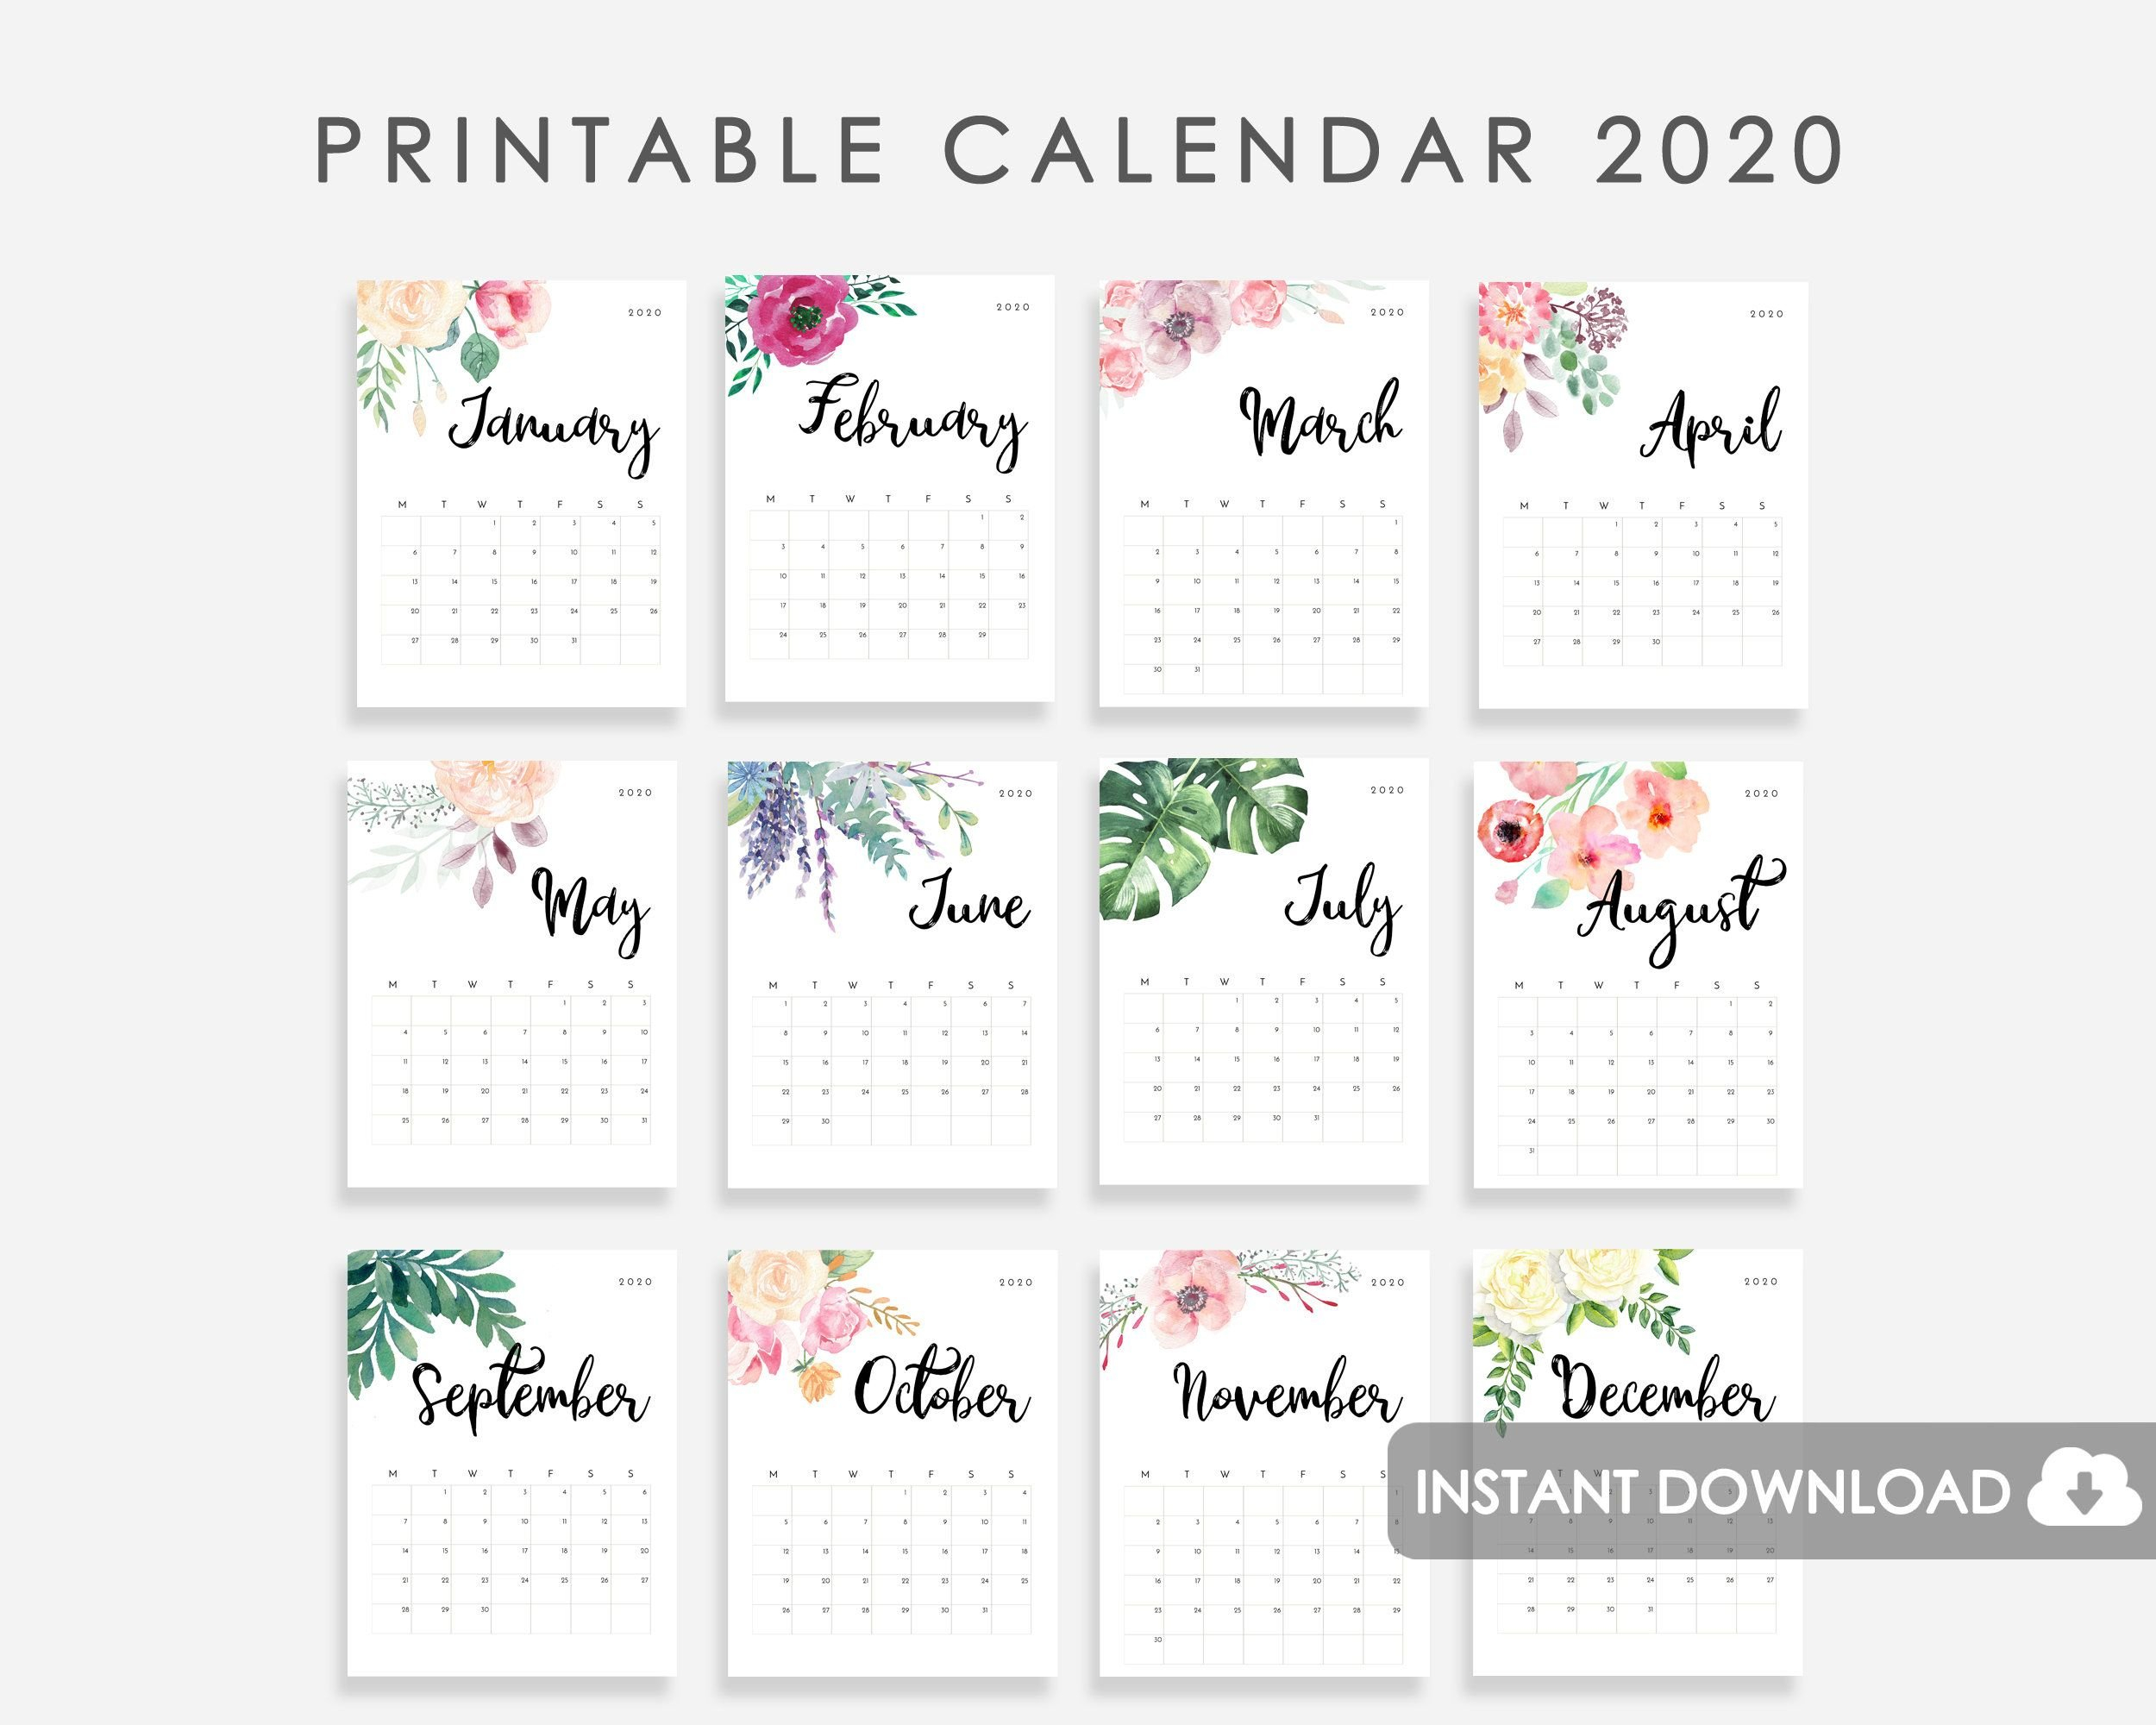 2020 Calendar Printable, Desk Calendar 2020, 2020 Wall Small Calendar Page To Print For Desk